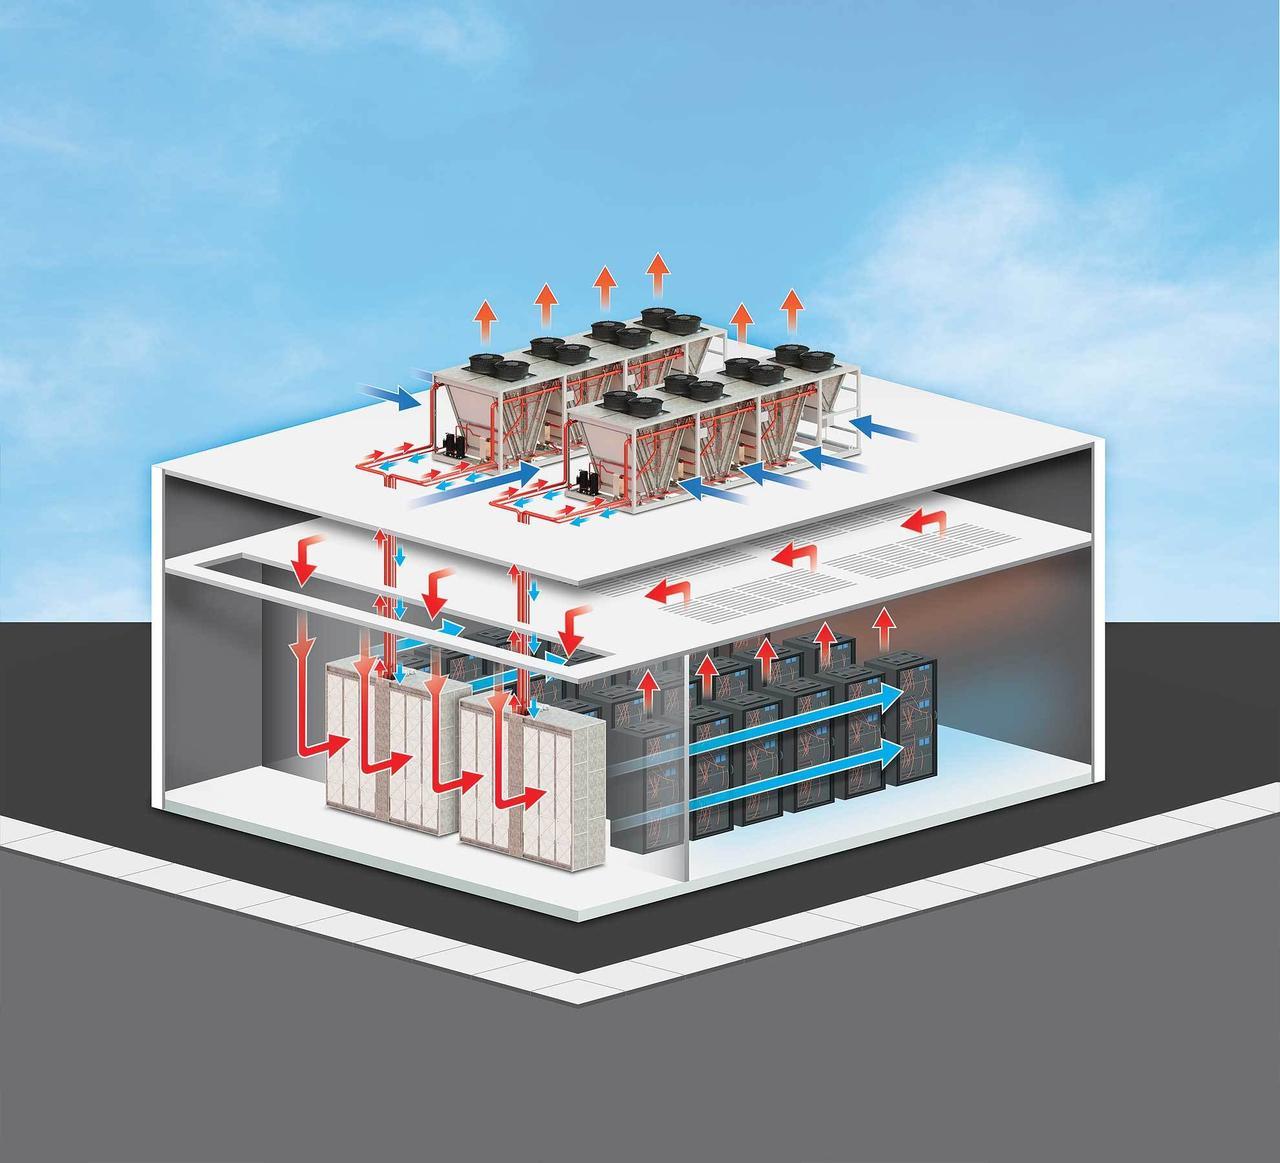 Naval architecture, Urban design, Rectangle, Lego